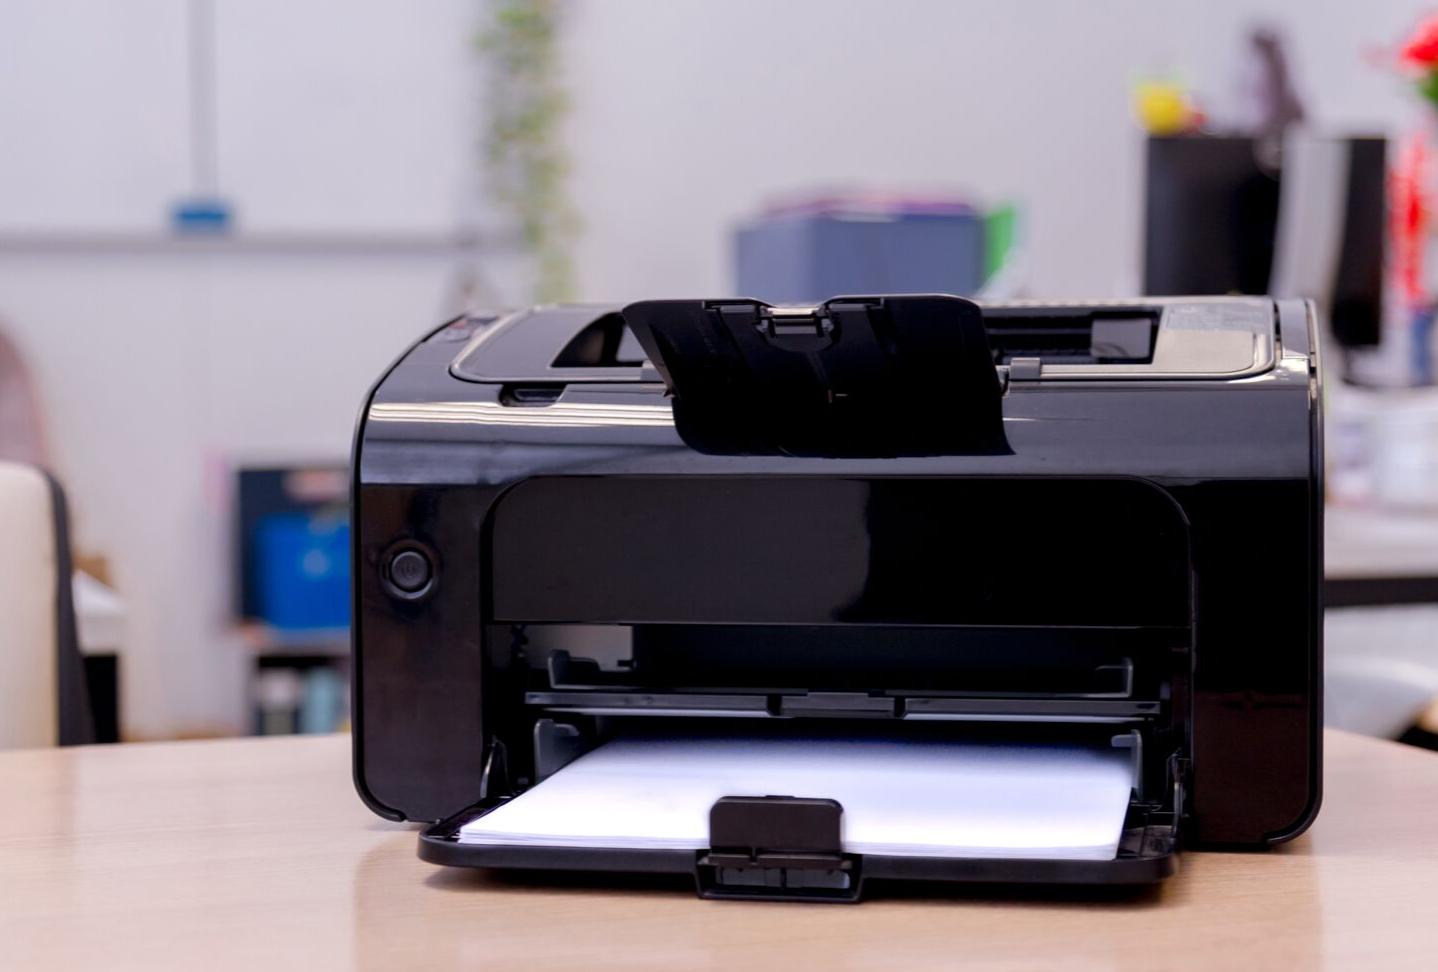 Laser printer that is not printing